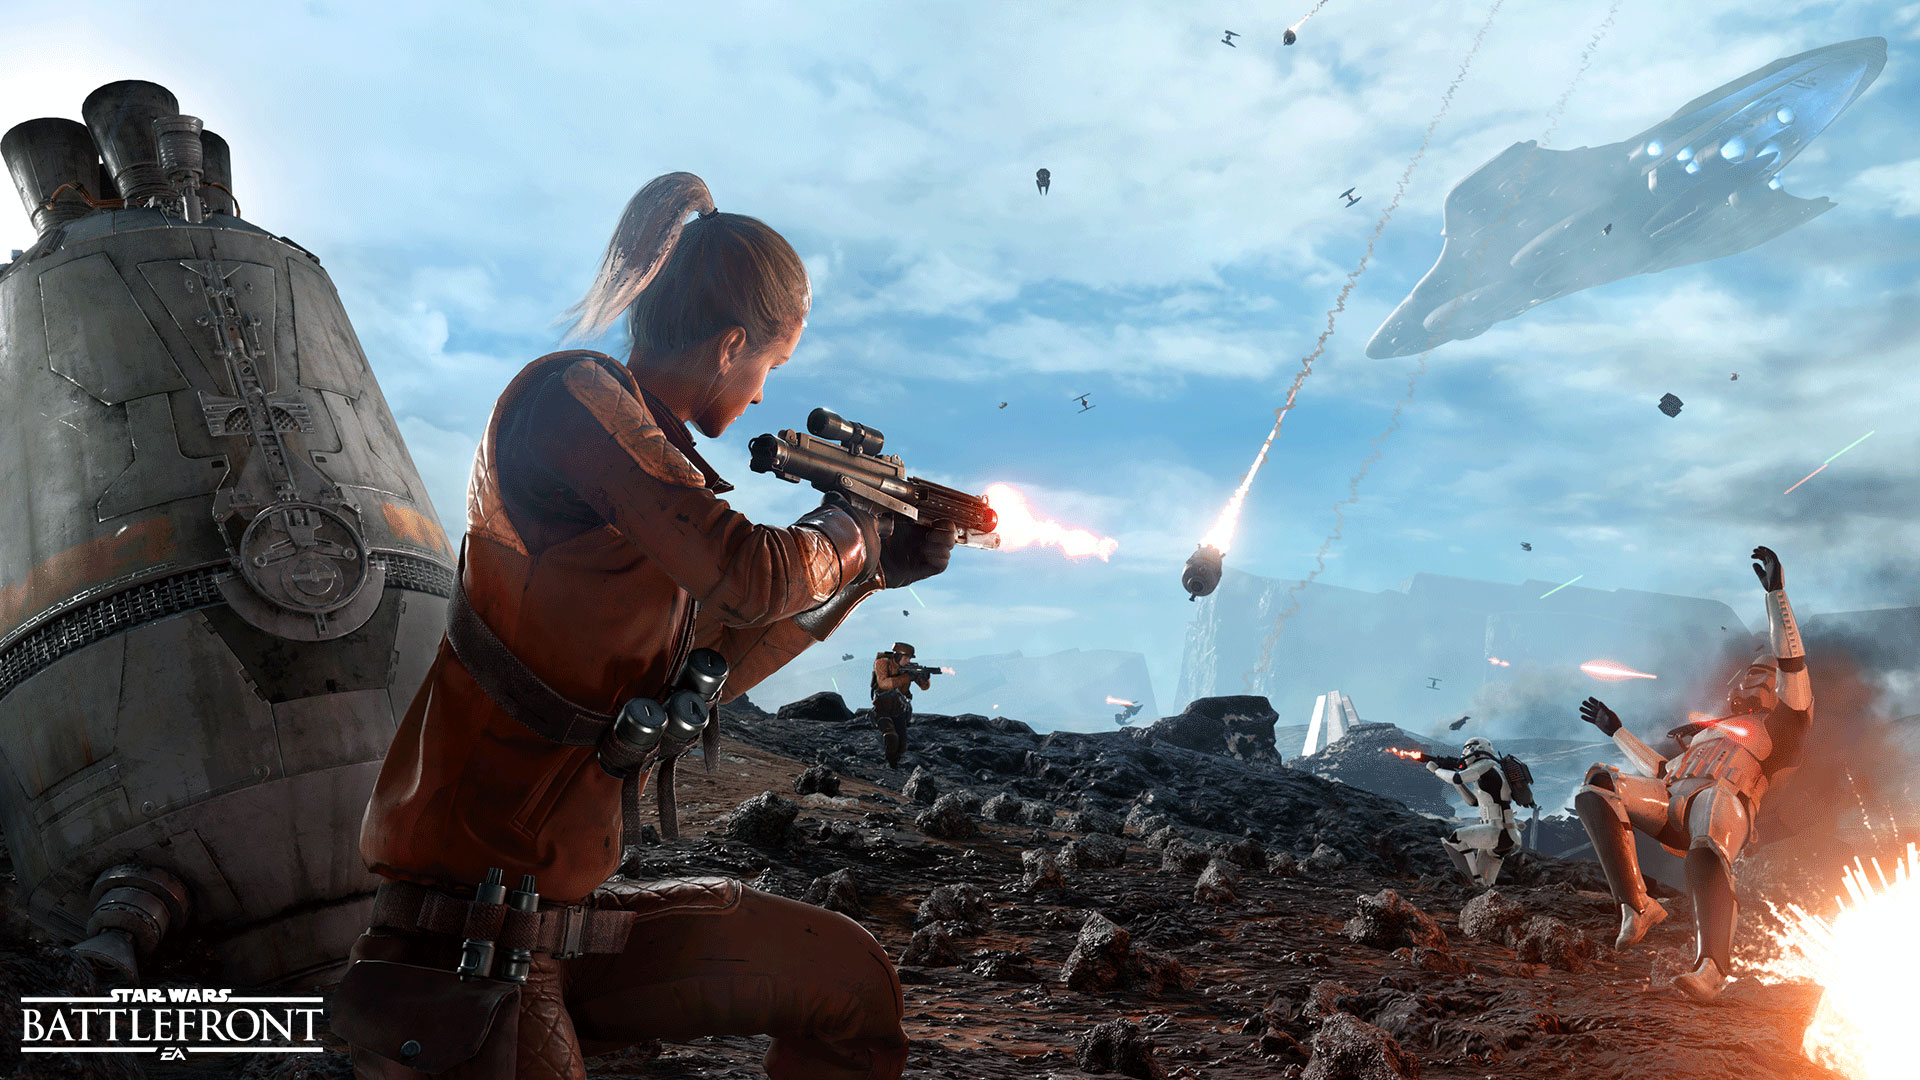 Star Wars Battlefront screen